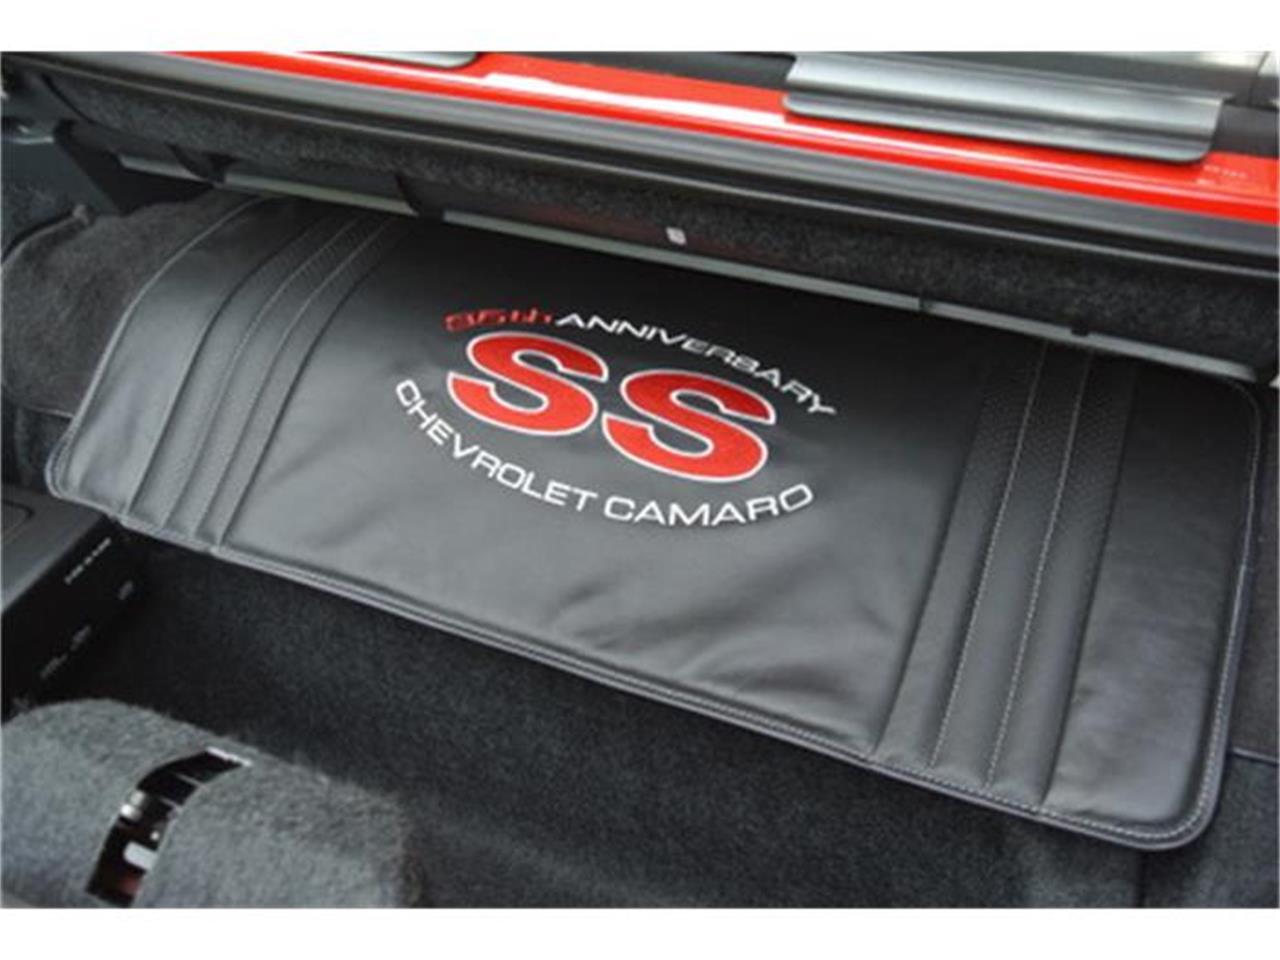 Large Picture of 2002 Camaro located in Georgia - $28,950.00 - F0Y5